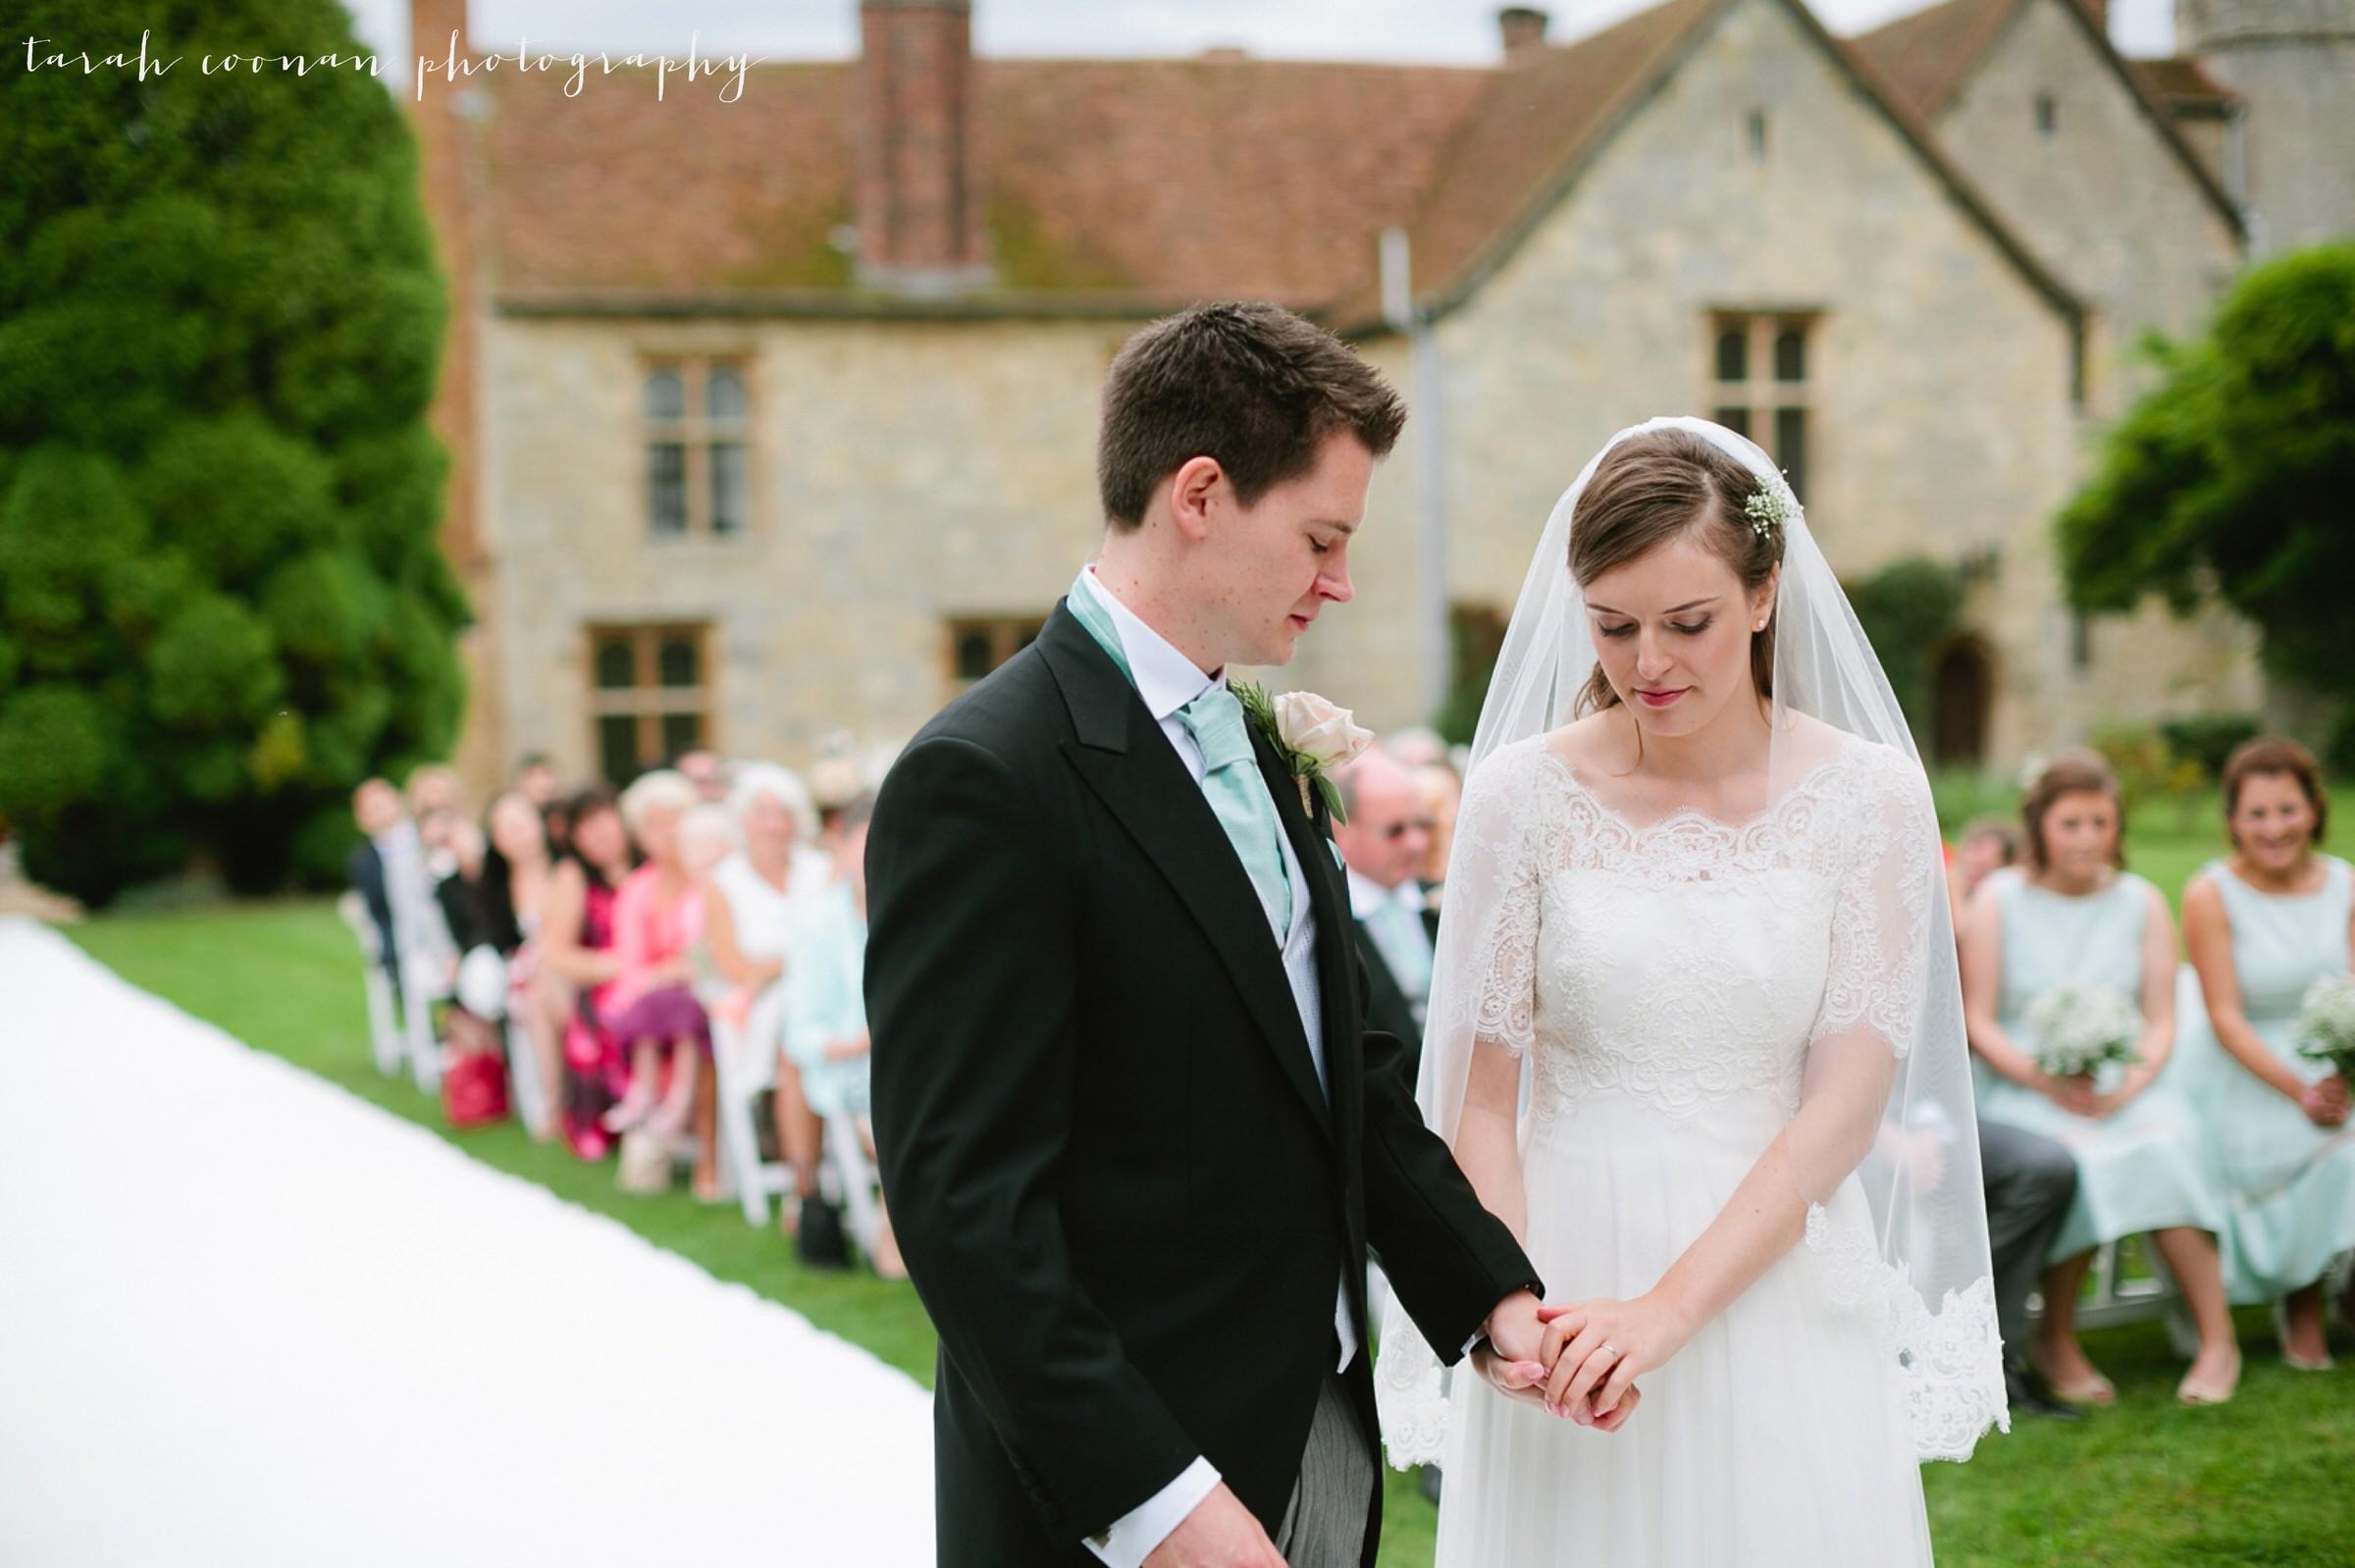 brighton-wedding-photographer25